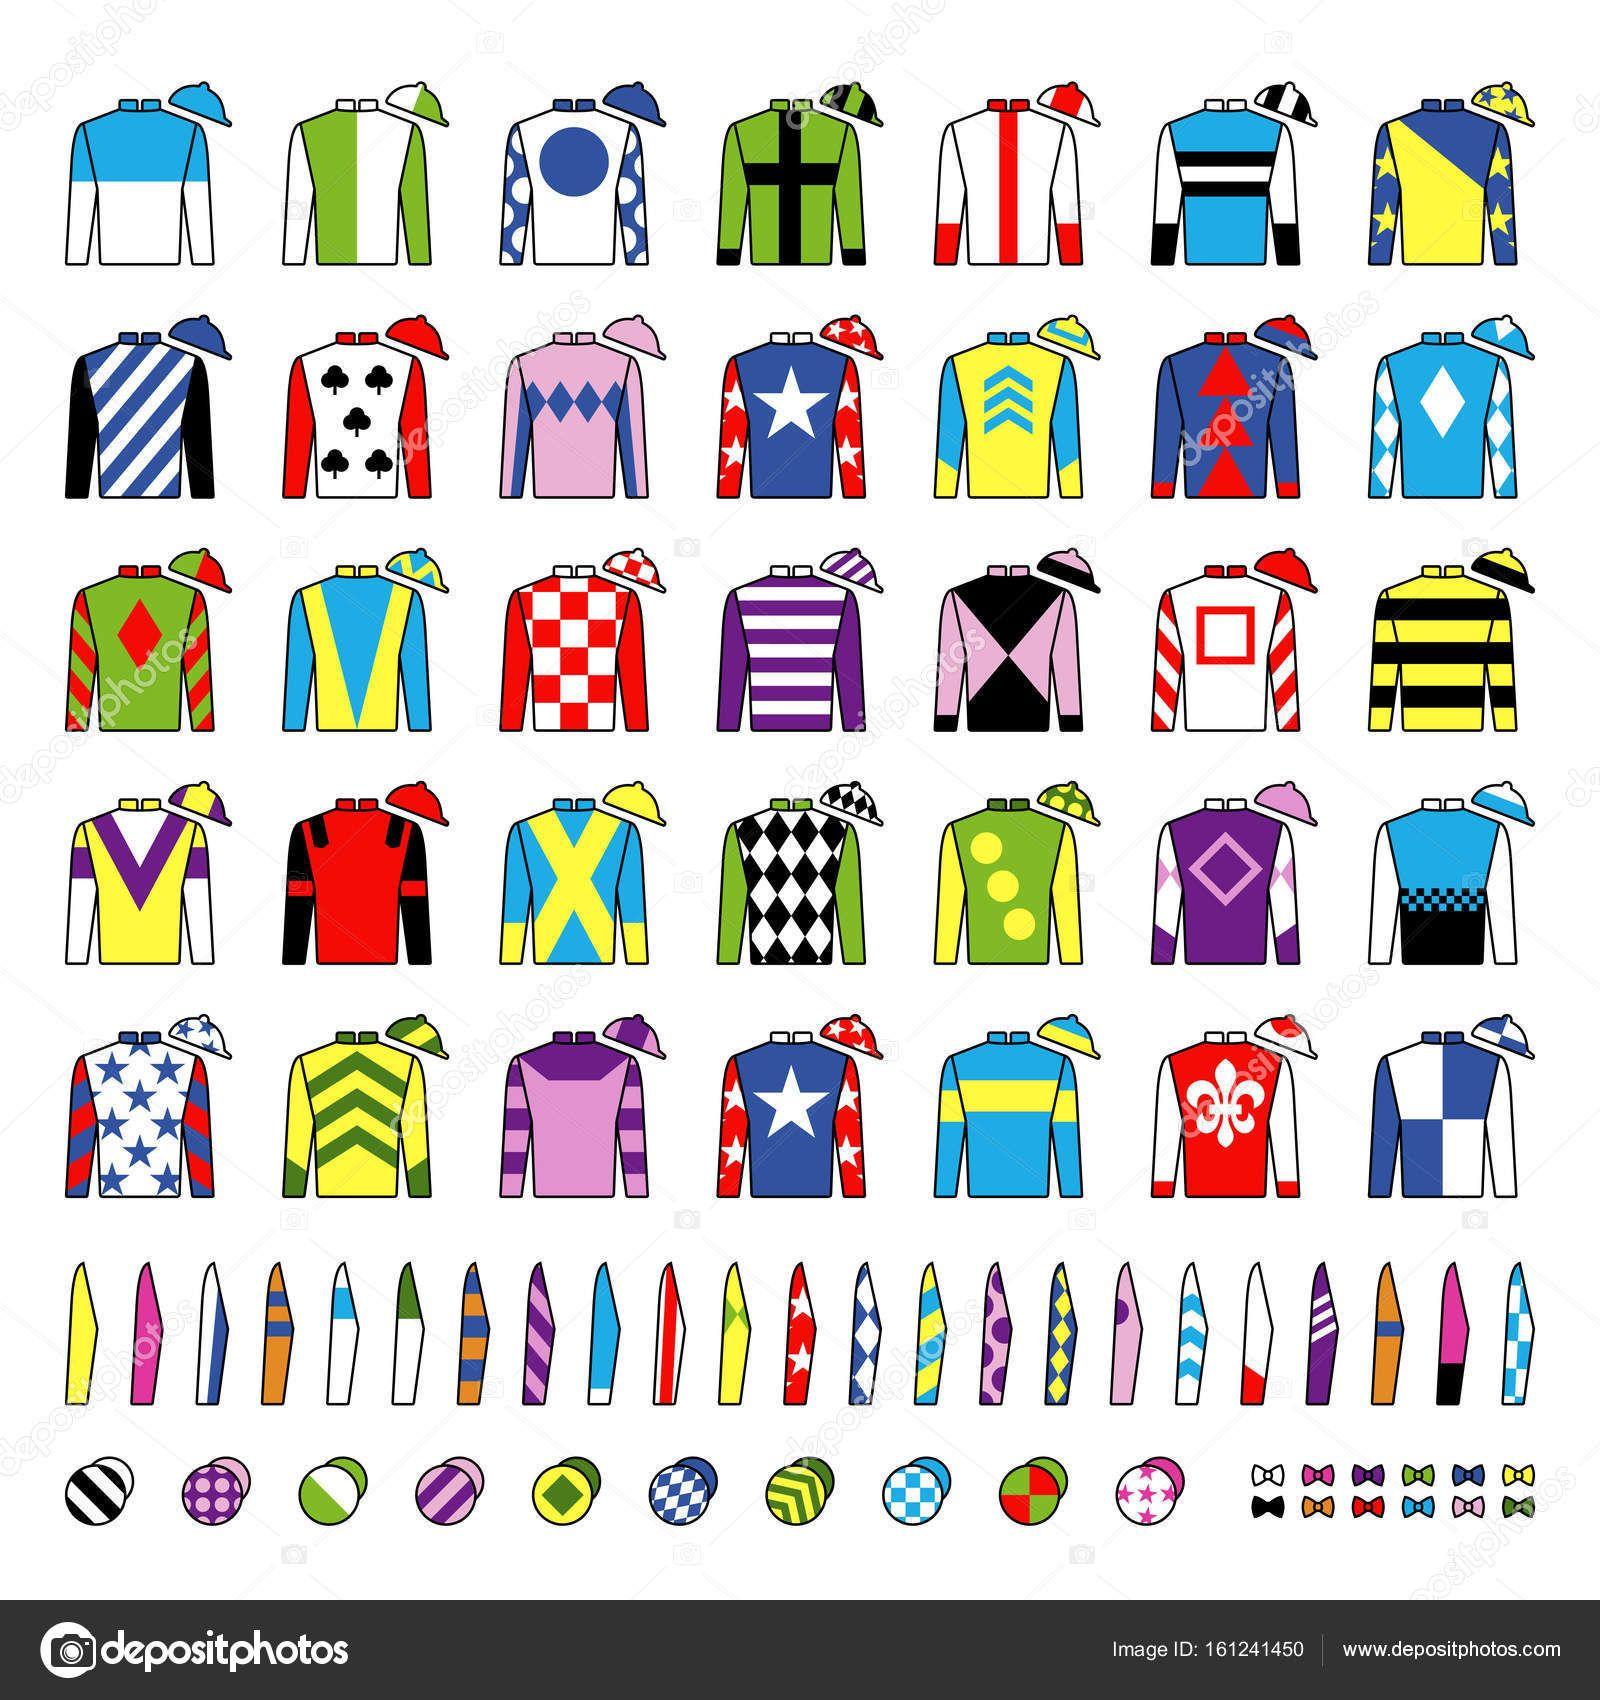 Download Jockey Uniform Traditional Design Jackets Silks Sleeves And Hats Horse Riding Horse Racing Icons Set Isola Jockey Outfit Jockey Horse Racing